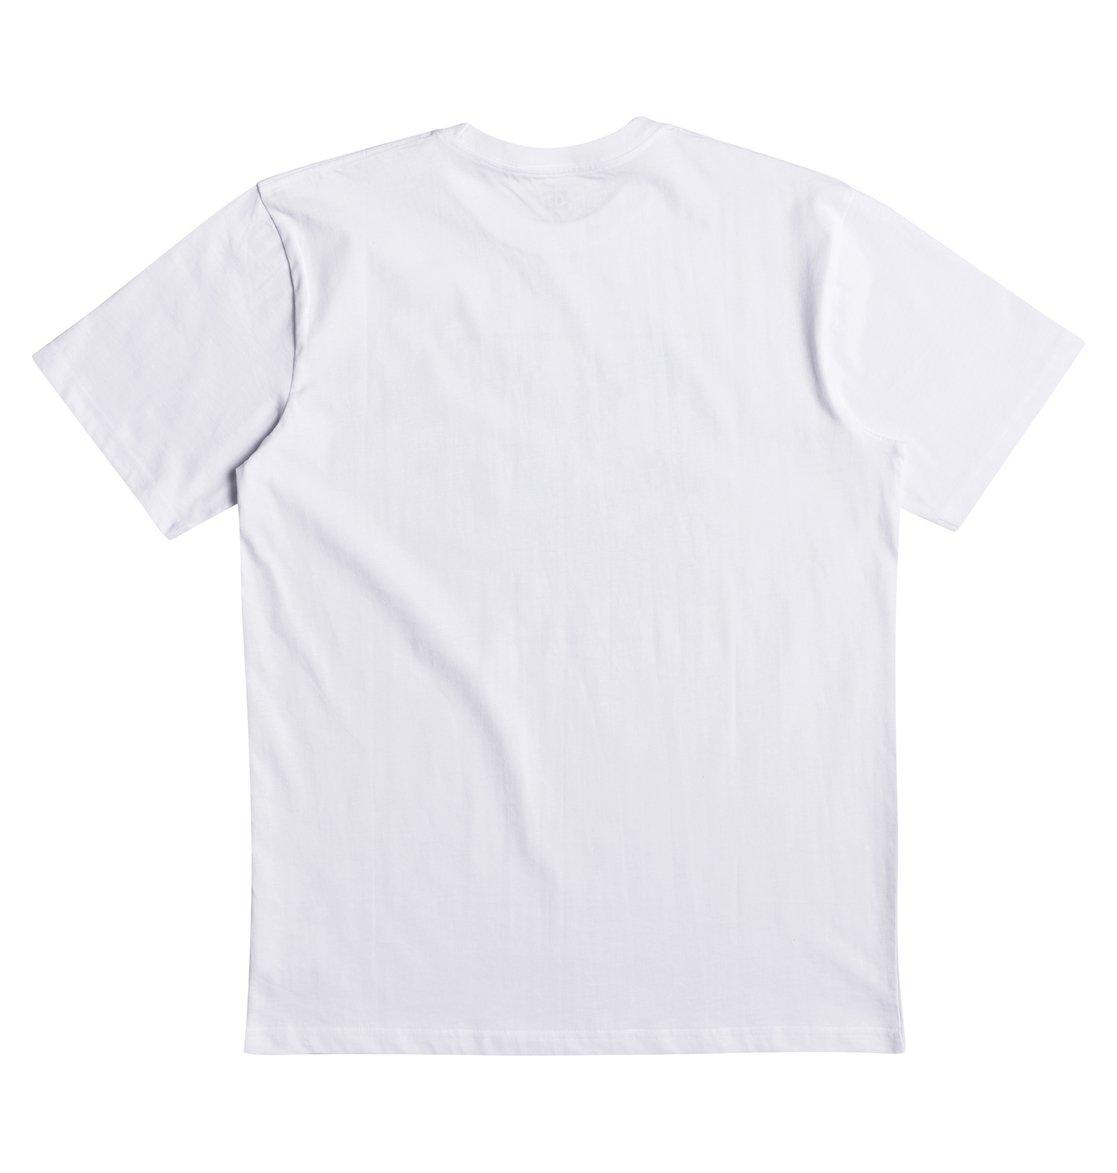 DC-Shoes-Sunset-Palms-Camiseta-para-Hombre-EDYZT03767 miniatura 10